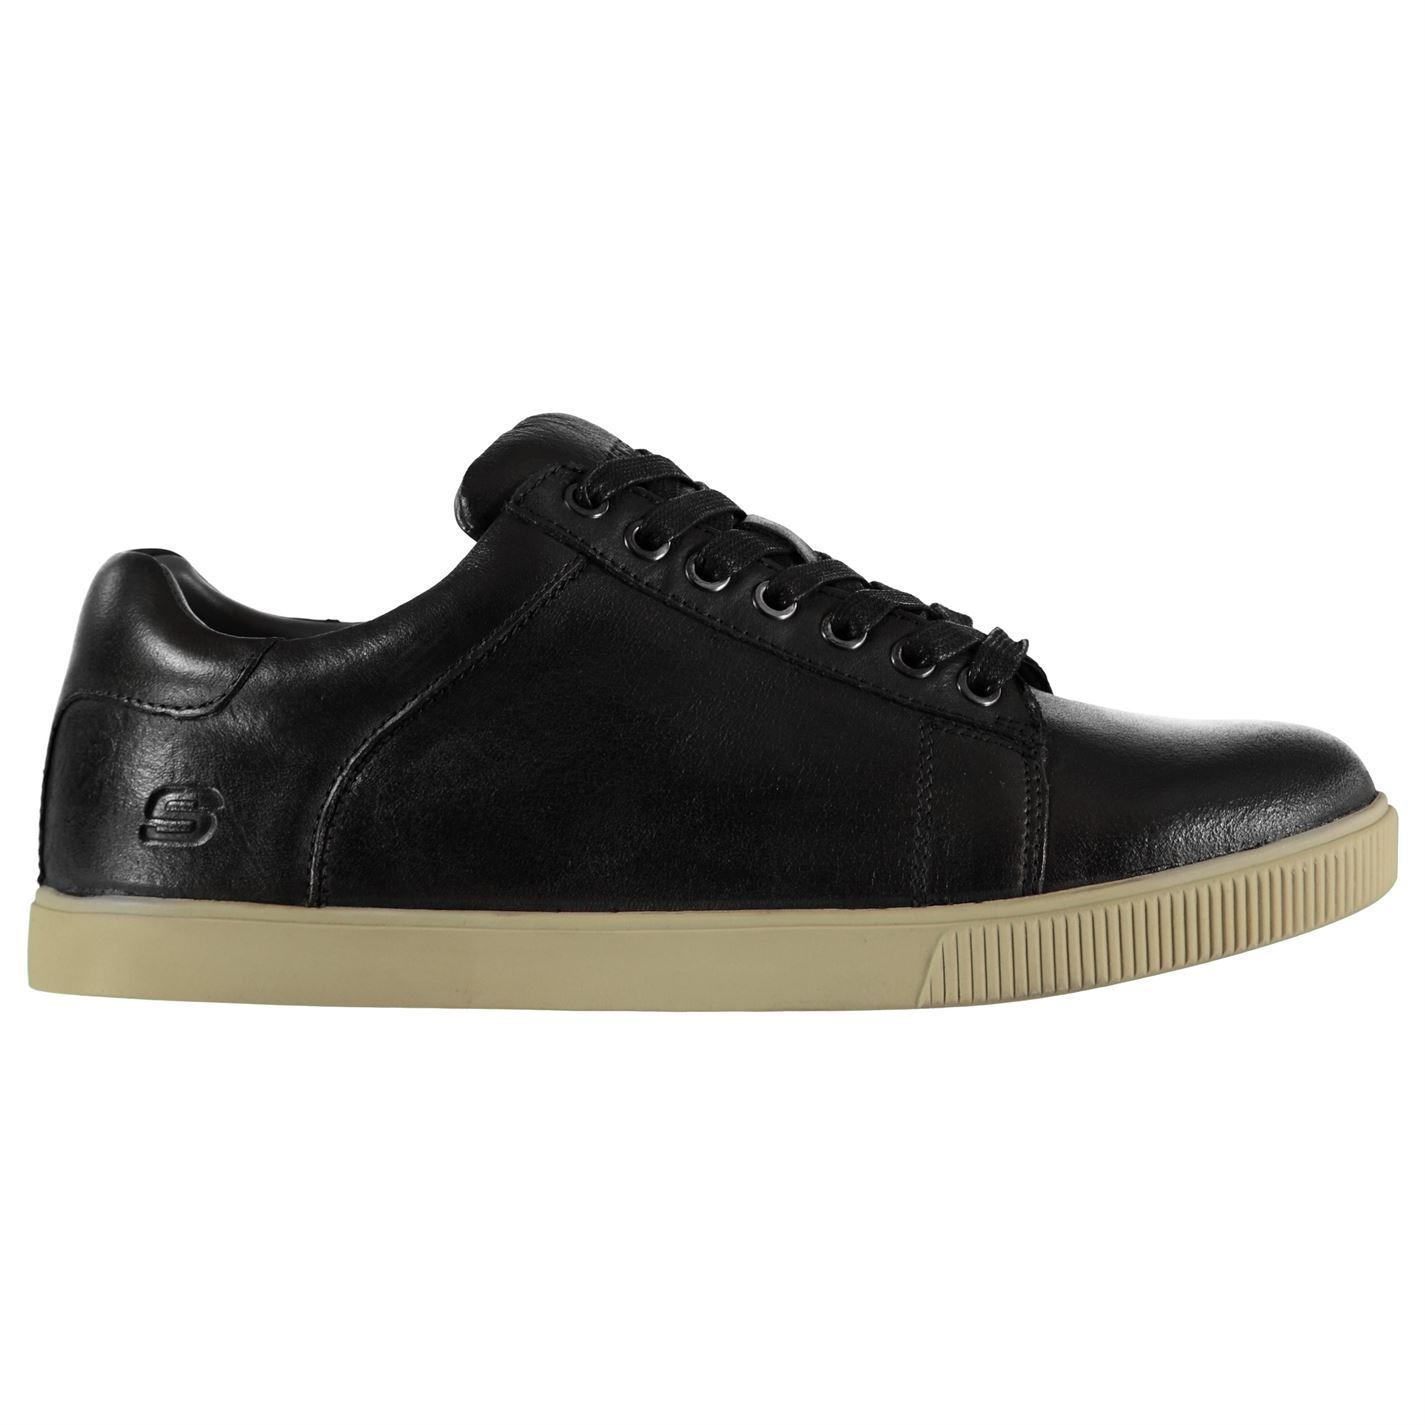 Skechers-Vol-Fandom-Homme-Chaussures-Baskets-decontractees-chaussures-baskets miniature 8